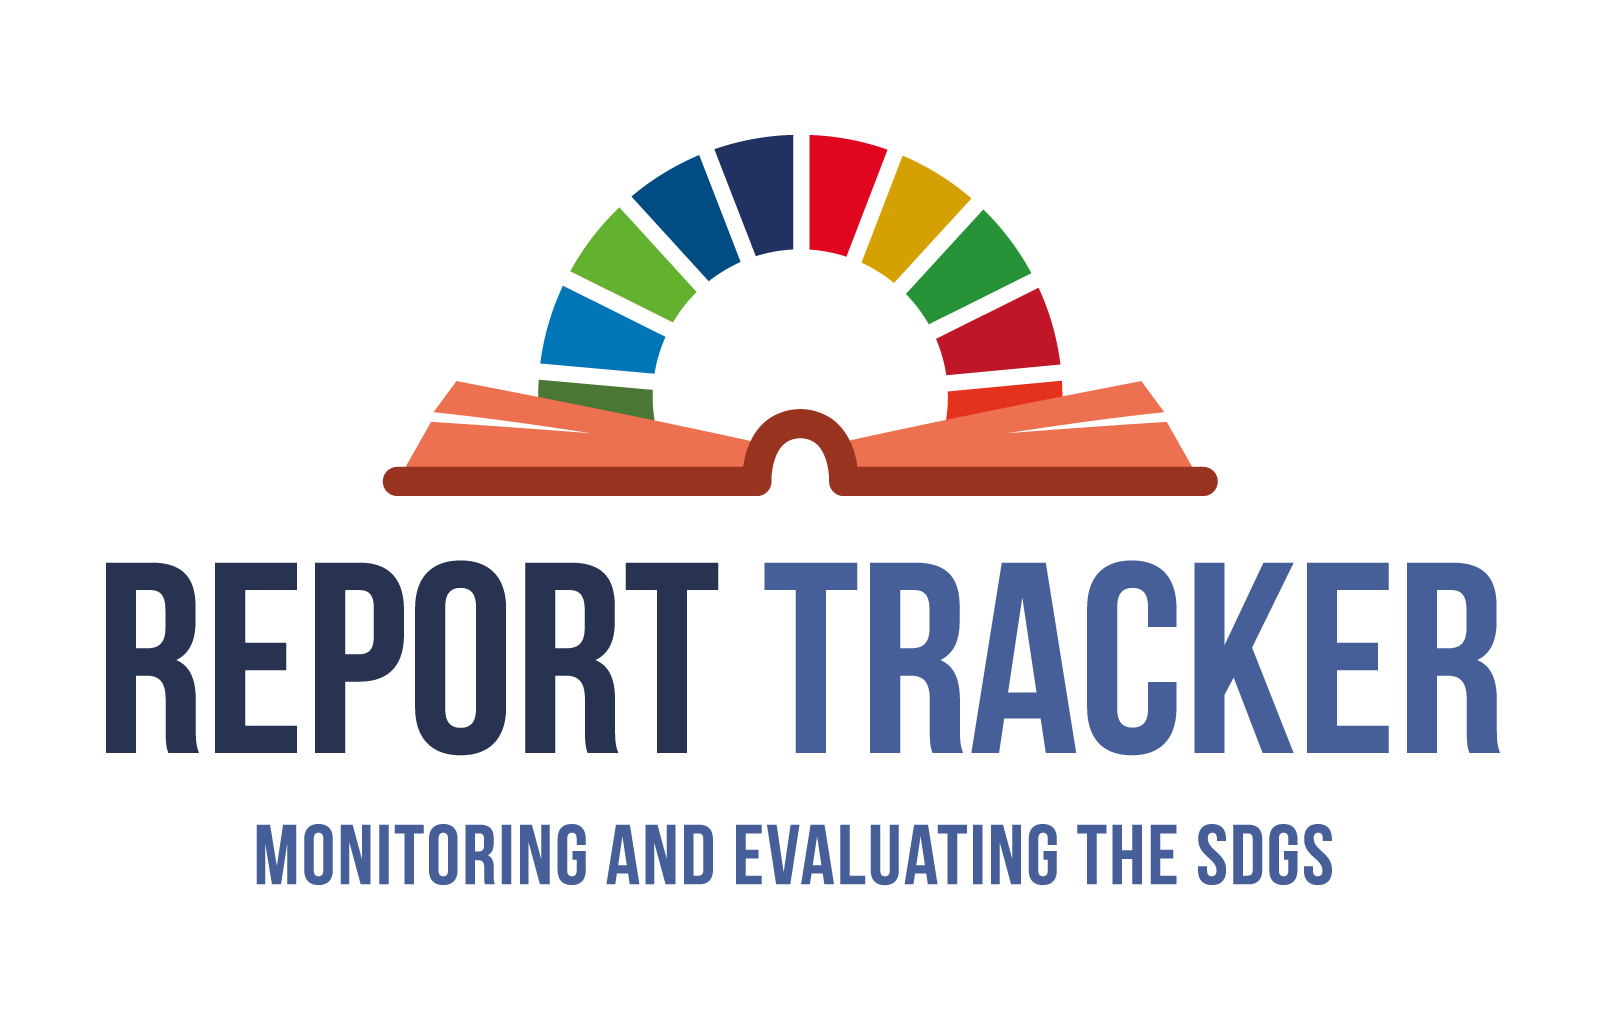 Report Tracker